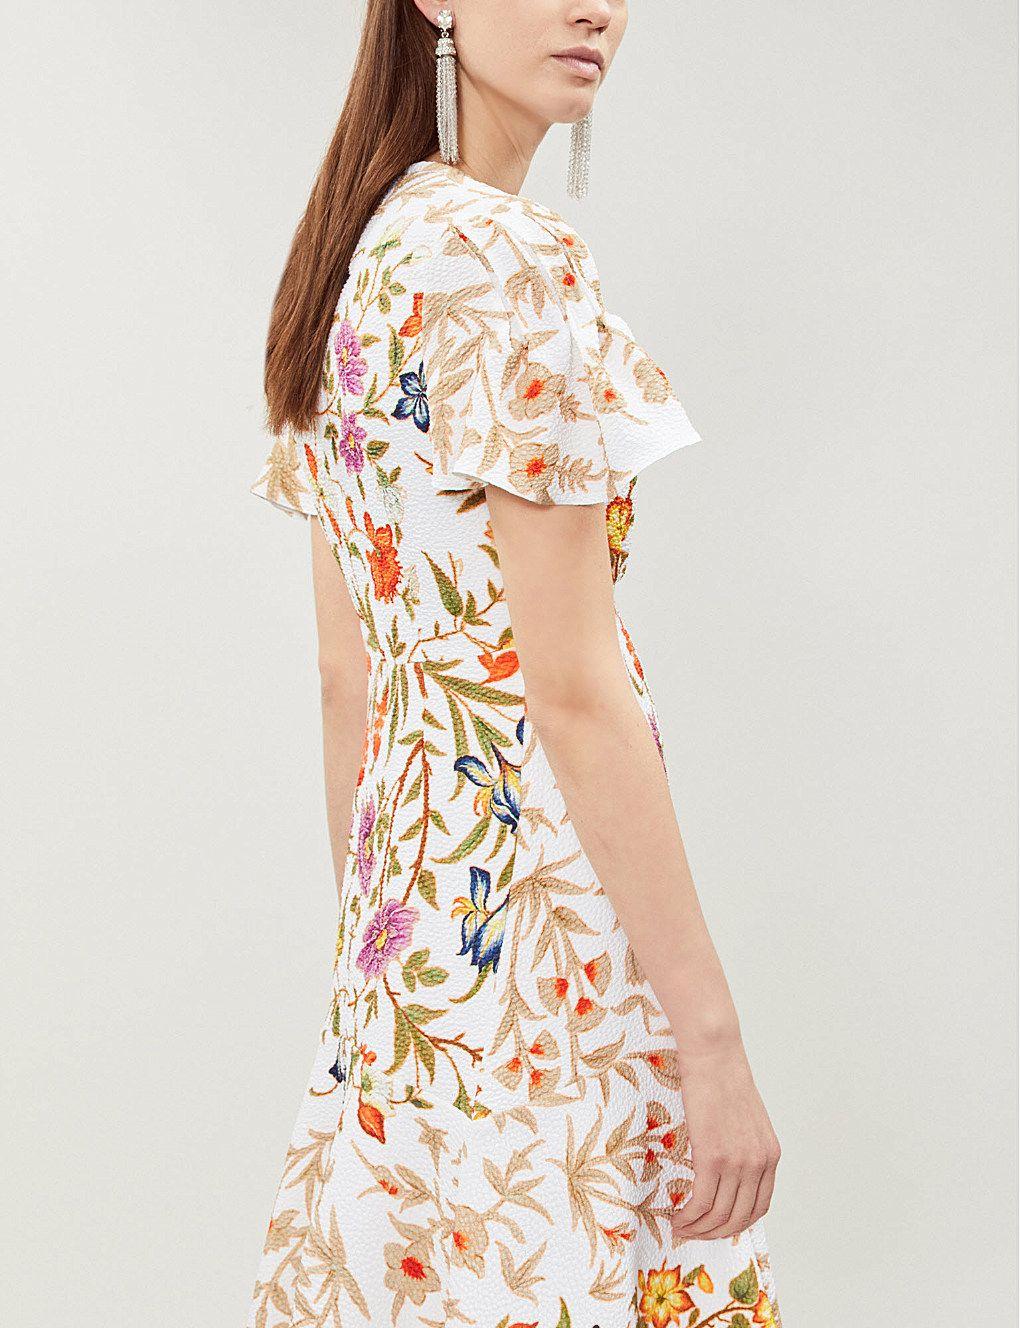 Floral Crepe Print Style Mini In Dress Ruffled 2019 dUqEgd